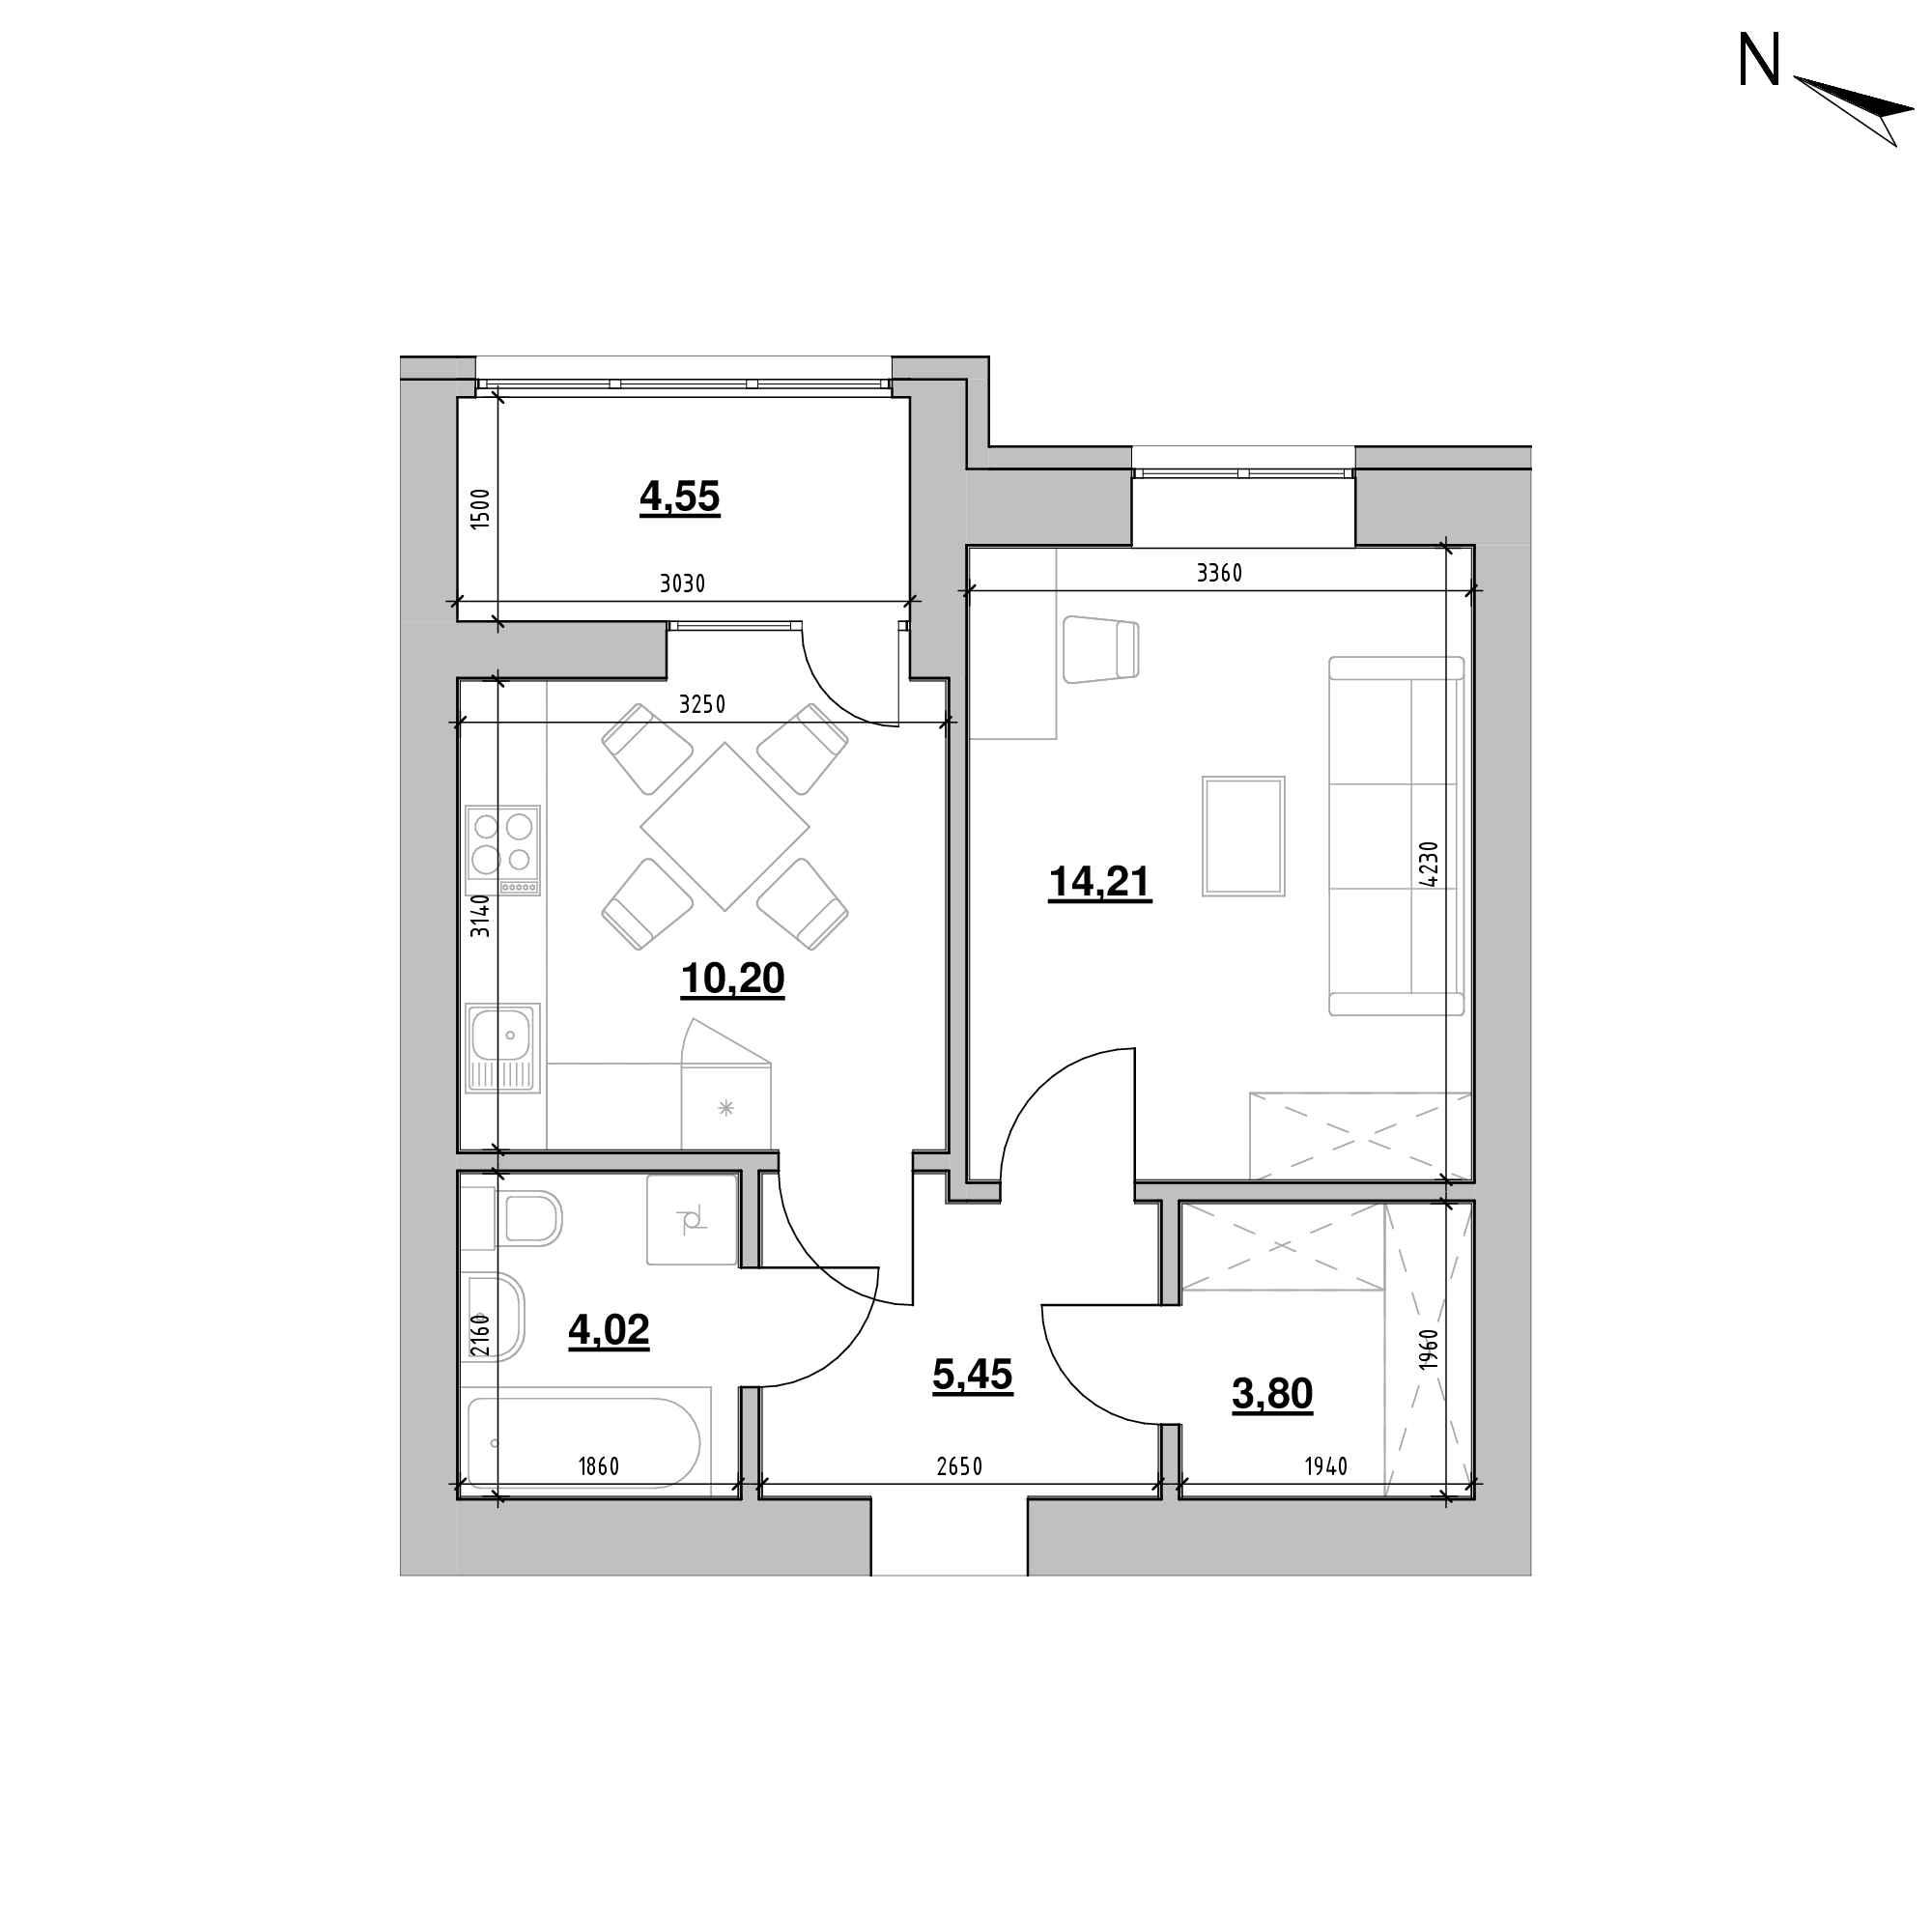 ЖК Шенген: планування 1-кімнатної квартири, №25, 42.23 м<sup>2</sup>